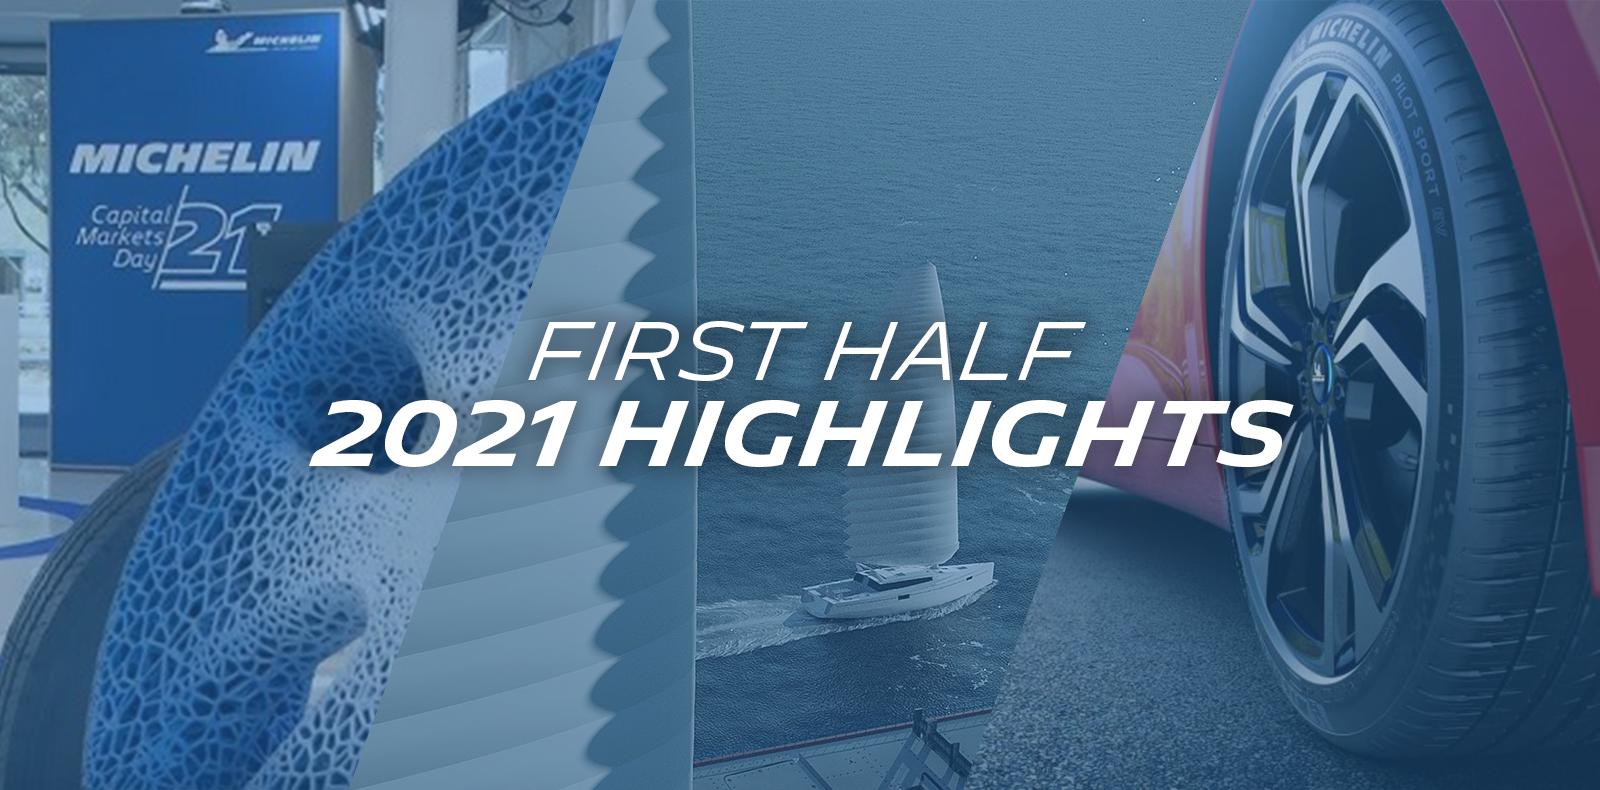 First Half 2021 Highlights